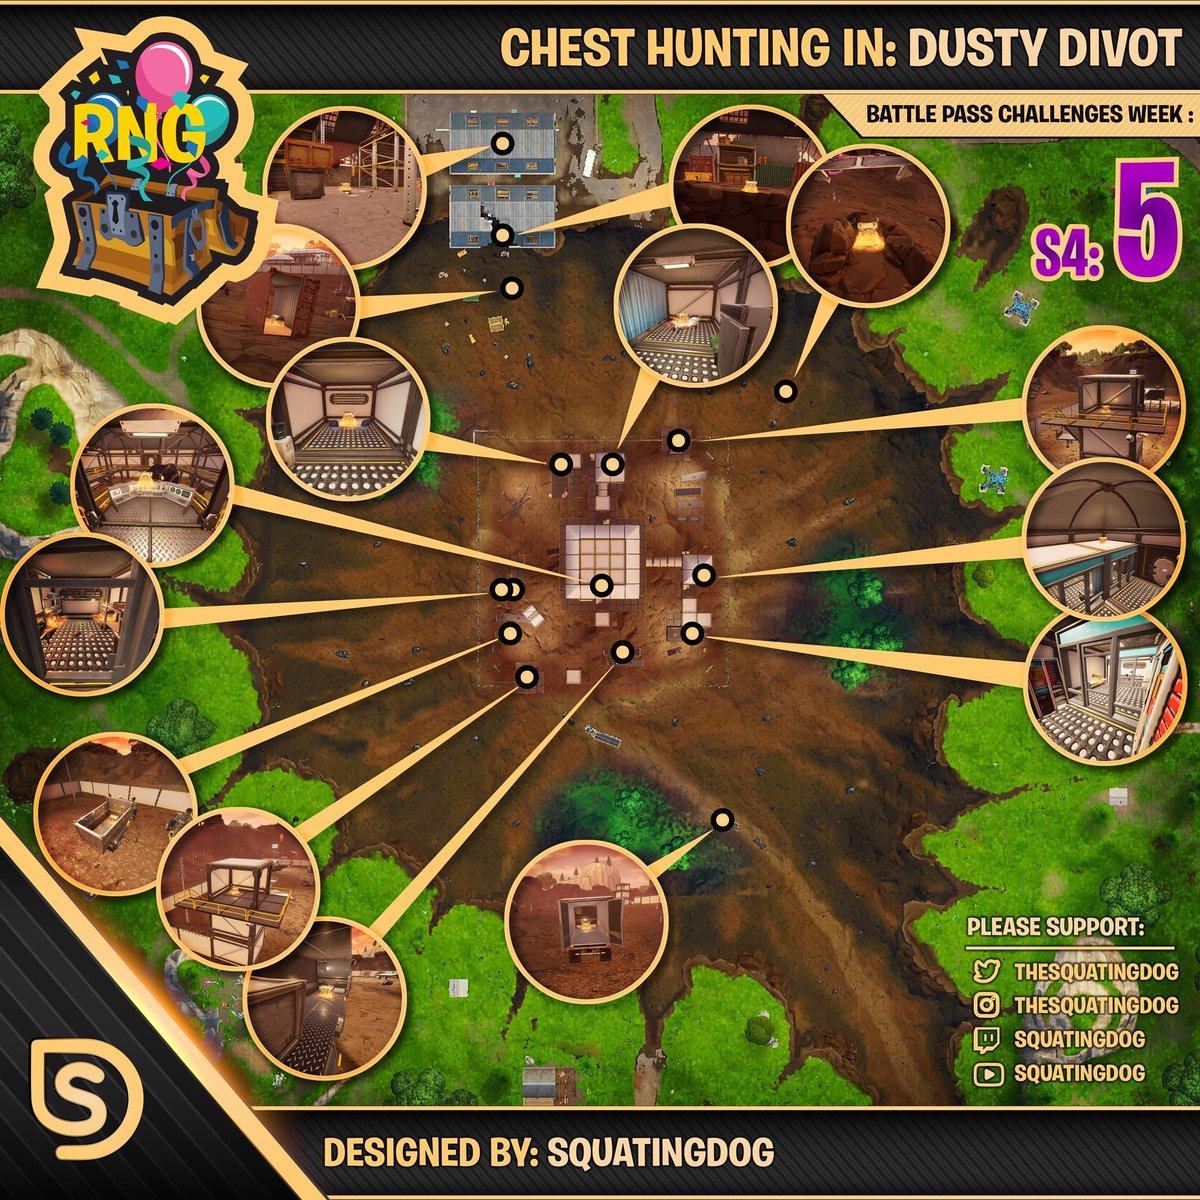 Season 4 Week 5 Chest Locations Dusty Divot Wheel Of Fortnite